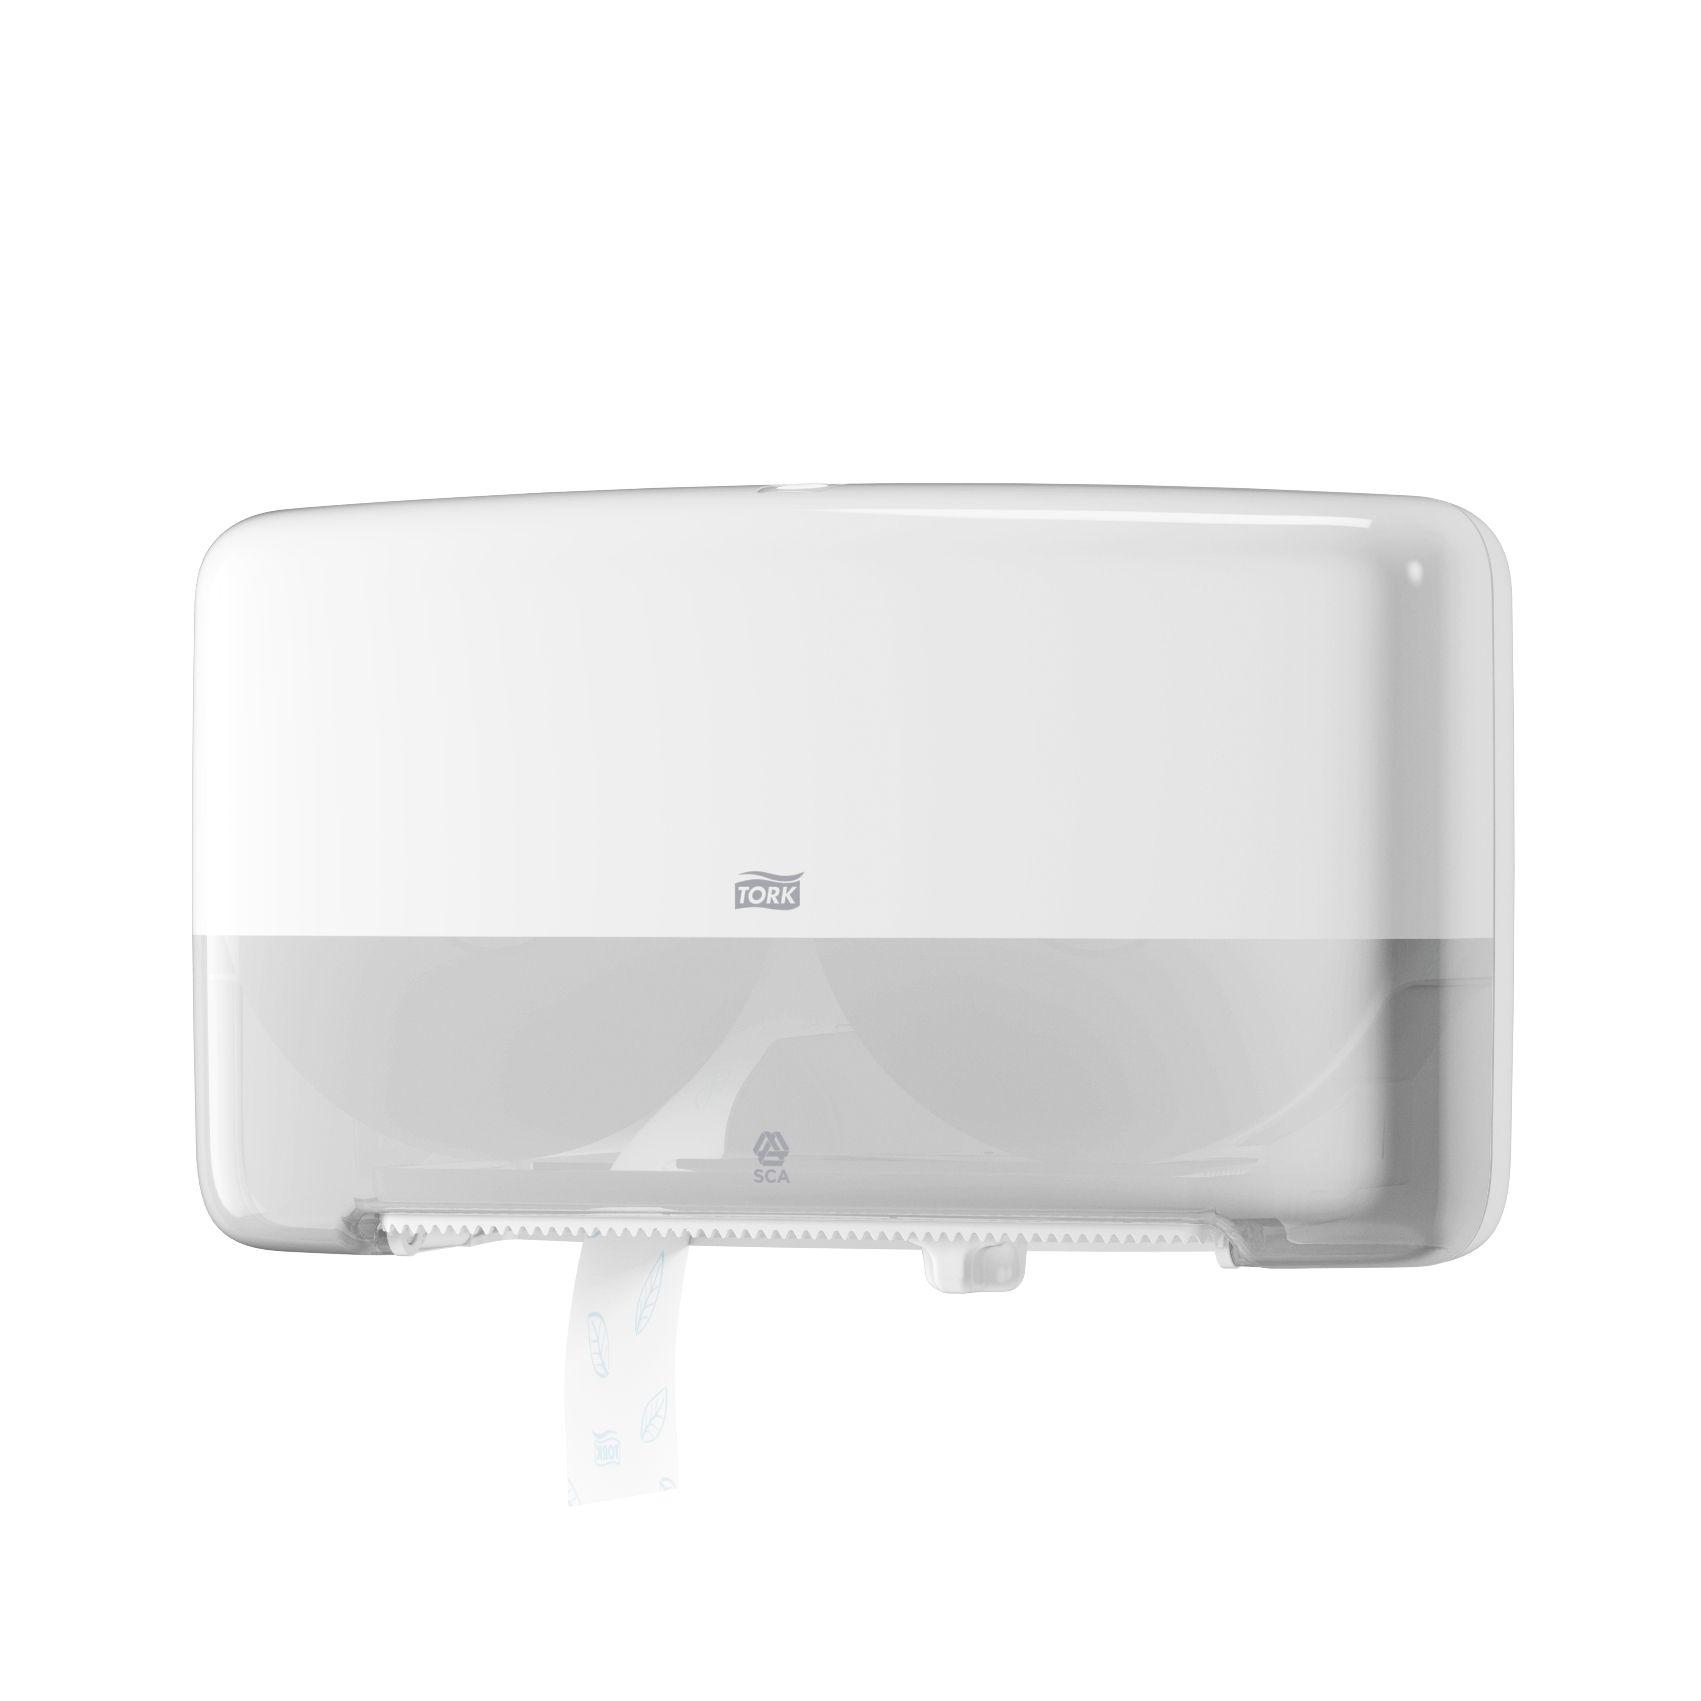 Tork Twin Mini Jumbo Toilet Roll Dispenser The compact